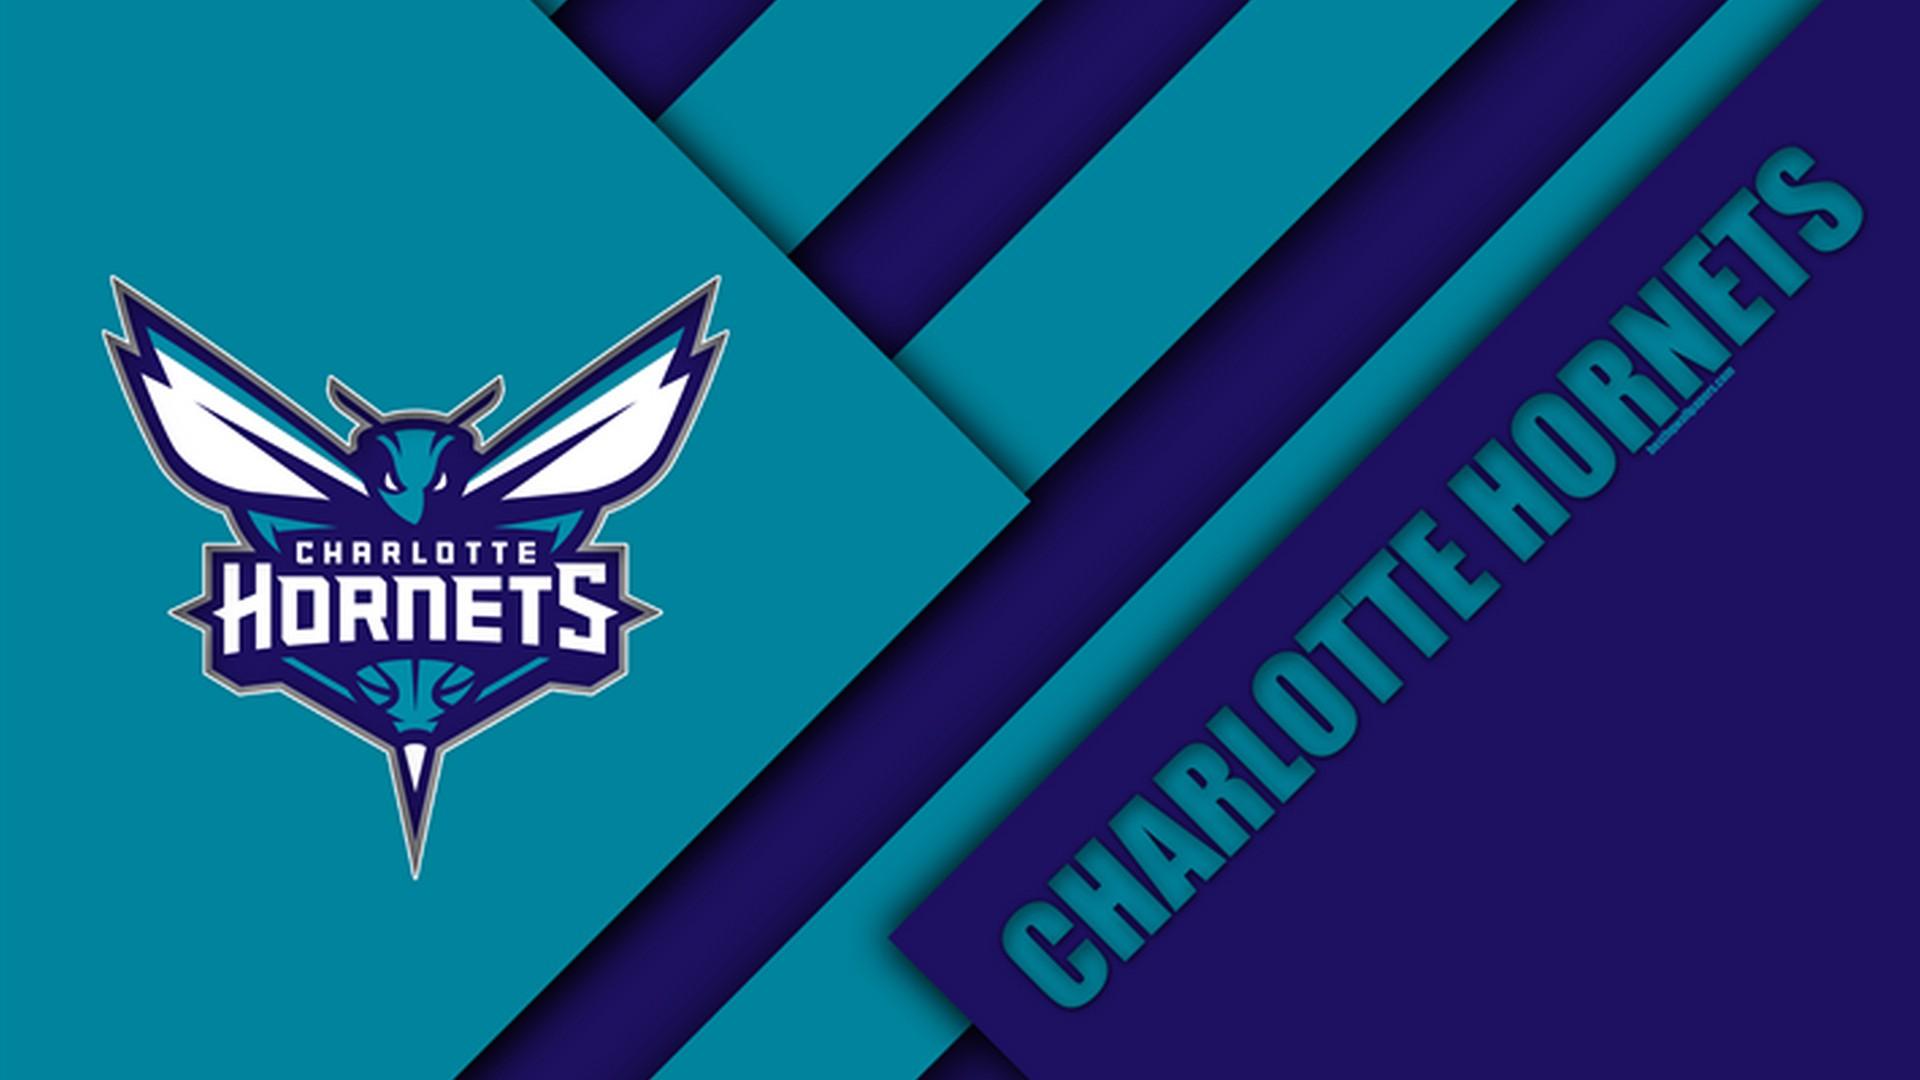 Wallpapers Charlotte Hornets 2019 Basketball Wallpaper 1920x1080